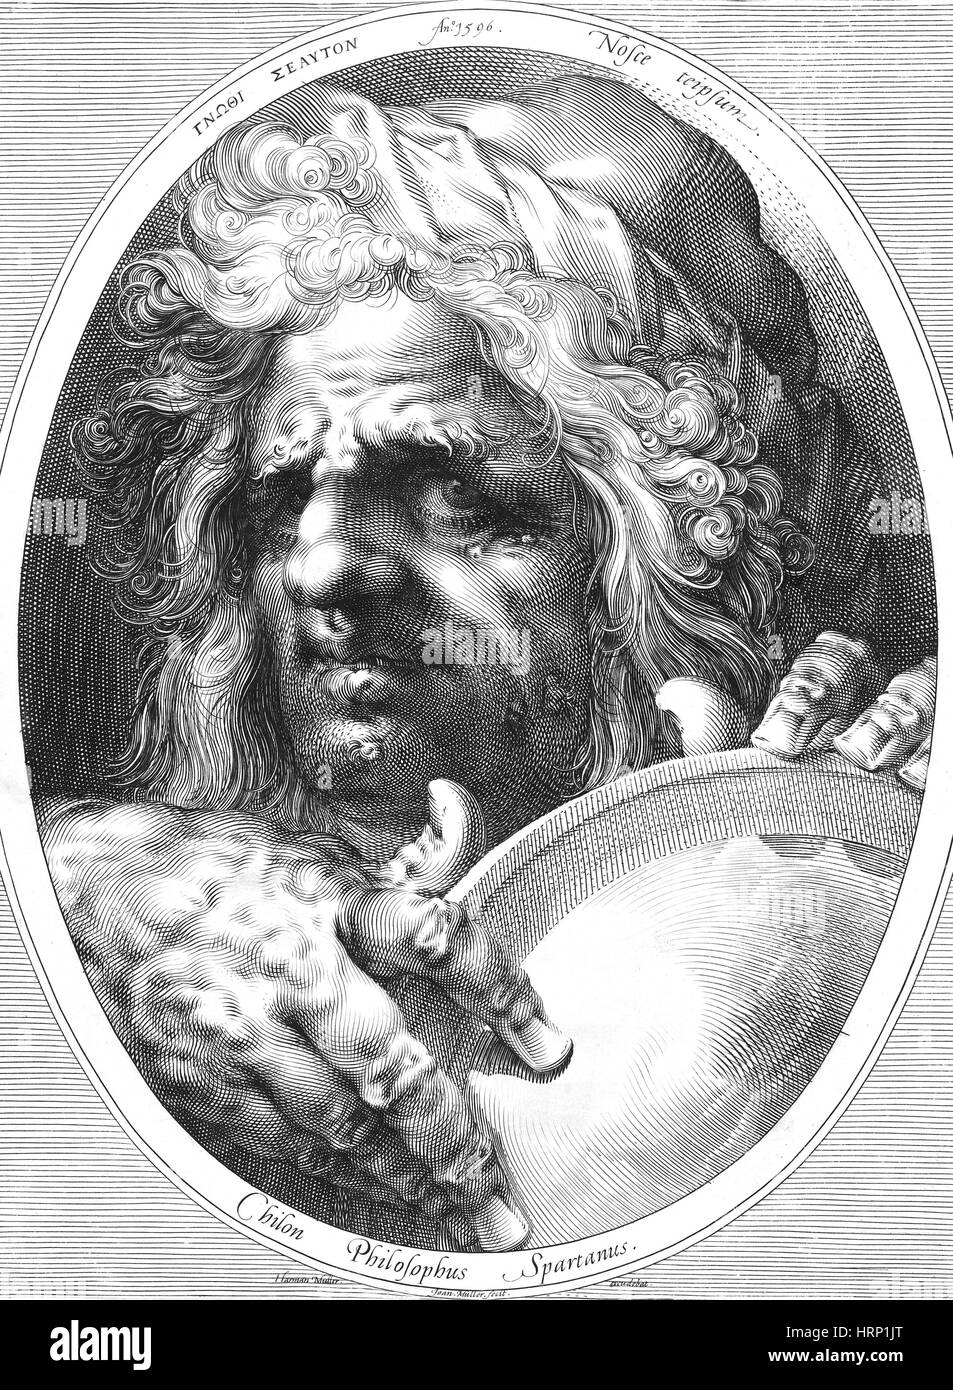 Chilon of Sparta, Sage of Greece Stock Photo